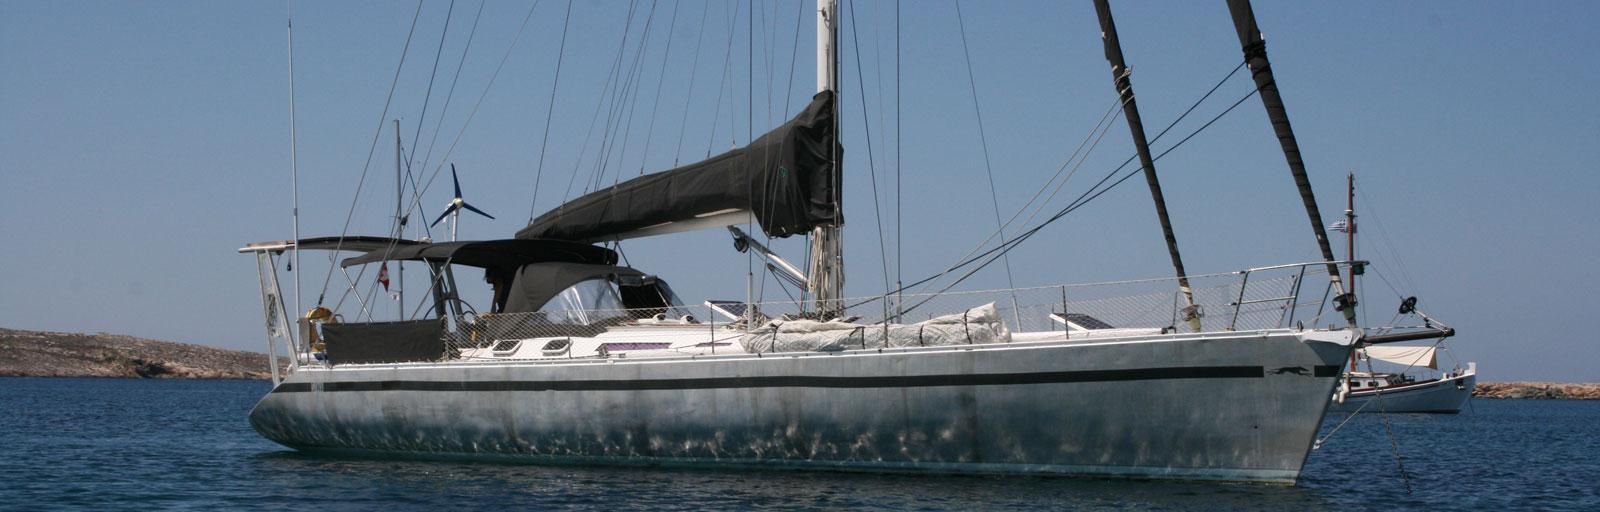 AYC Yachtbrokers - Levrier des mers 16m